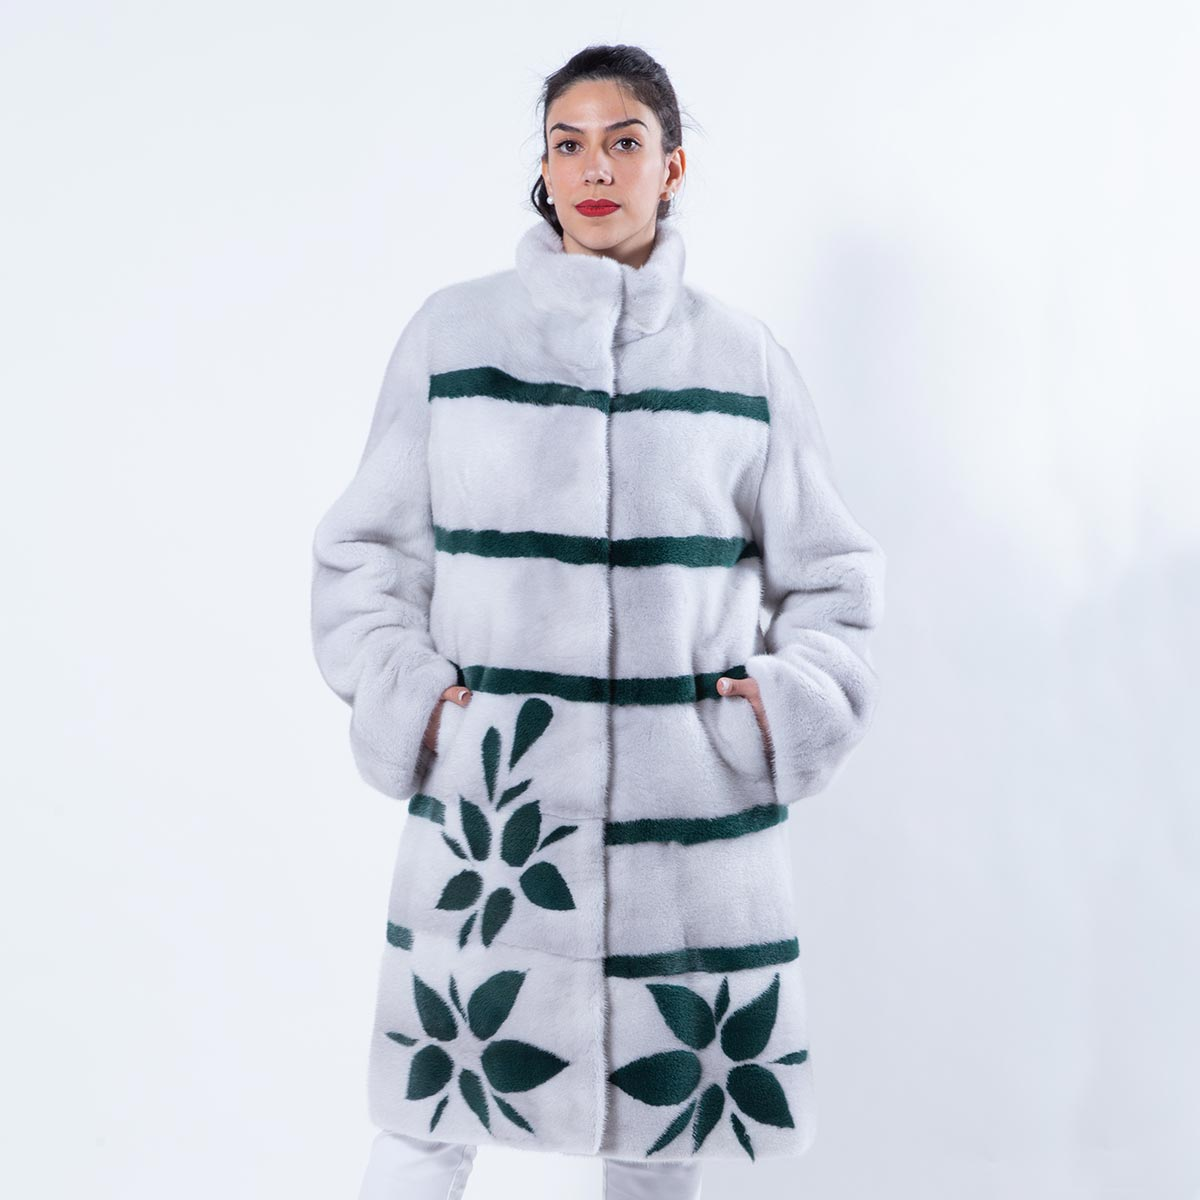 Violet Mink Jacket with Stripes and Flowers | Sarigianni Furs